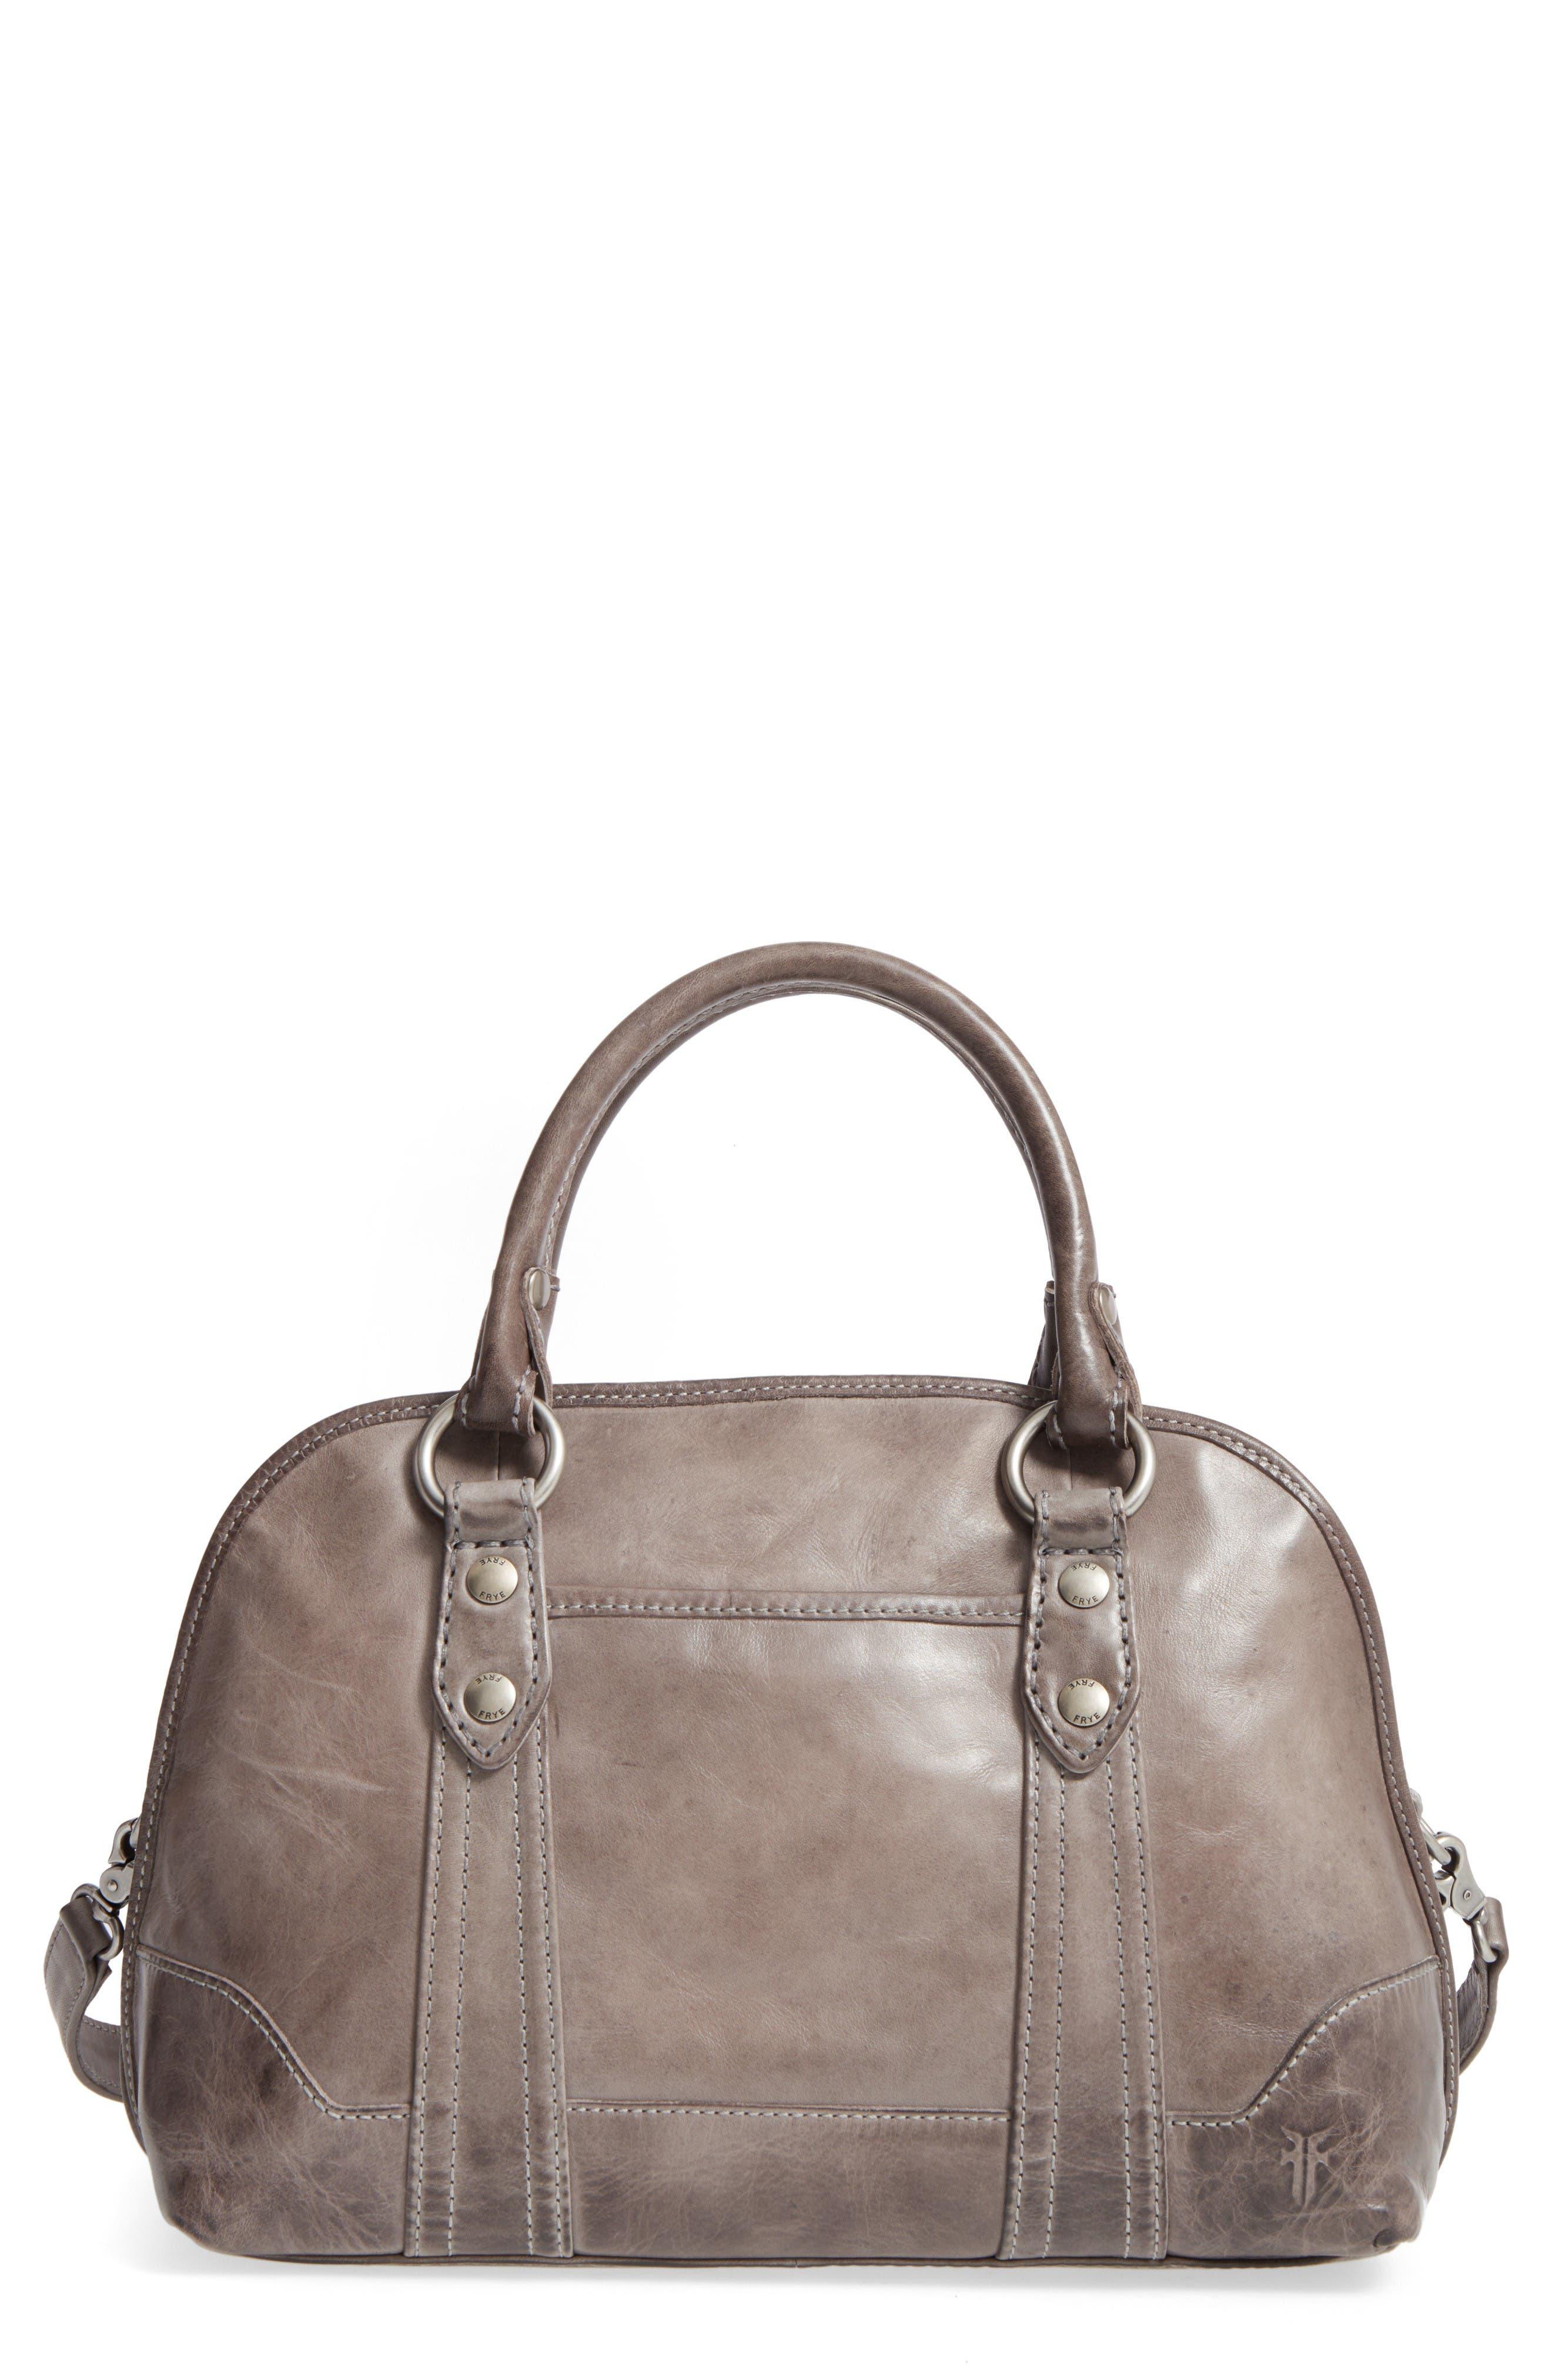 Main Image - Frye 'Melissa' Domed Leather Satchel